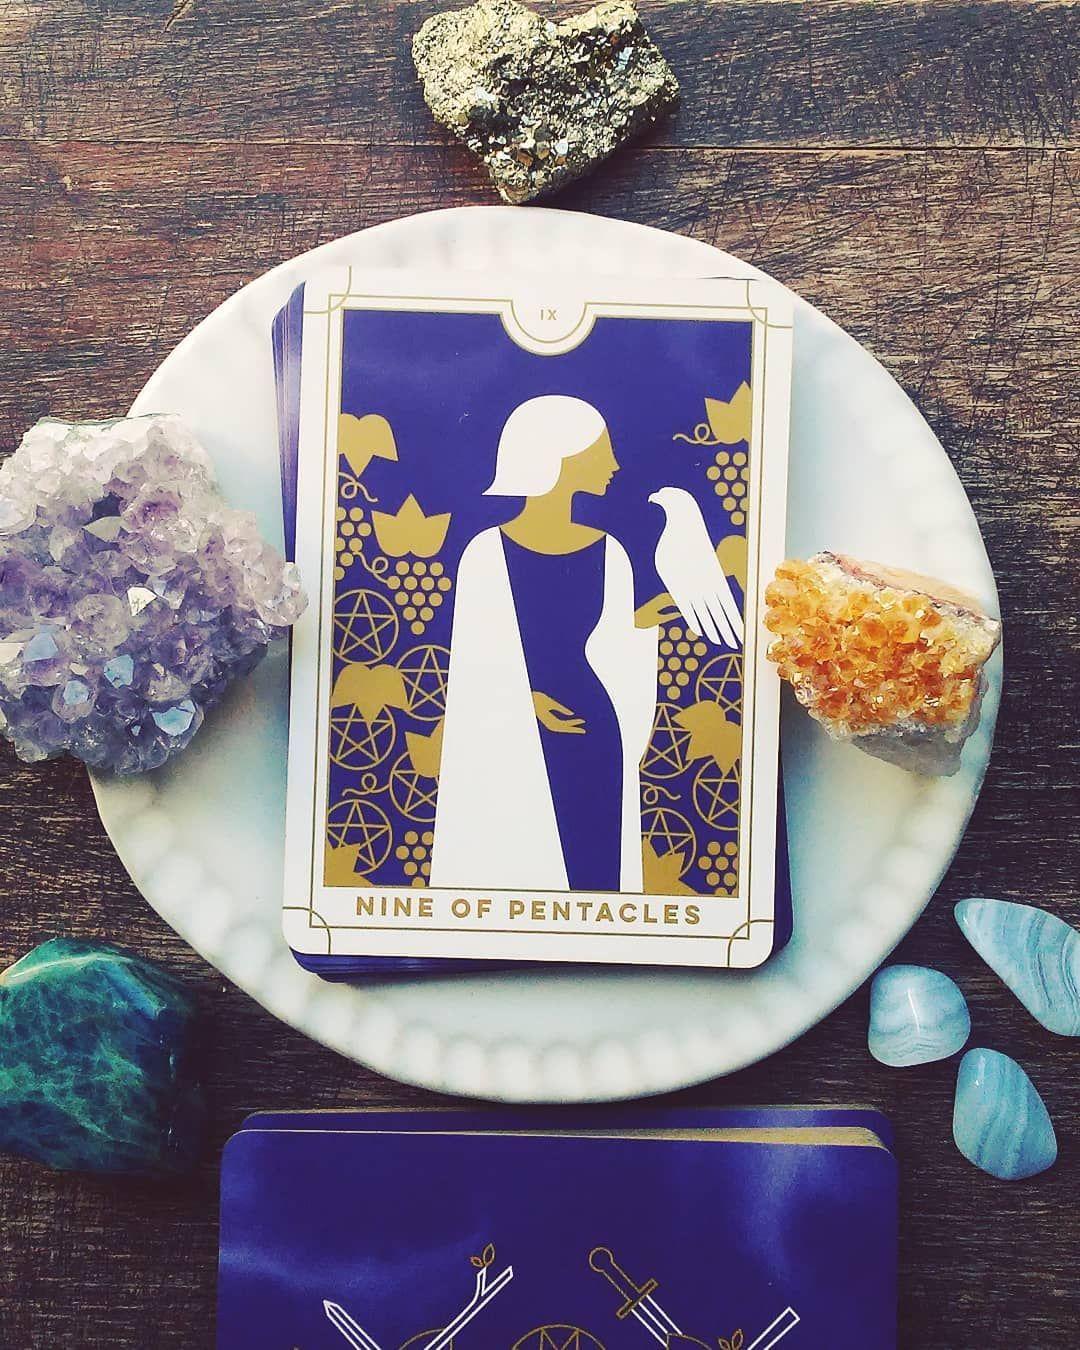 Everyday tarot deck by brigit esselmont of biddy tarot